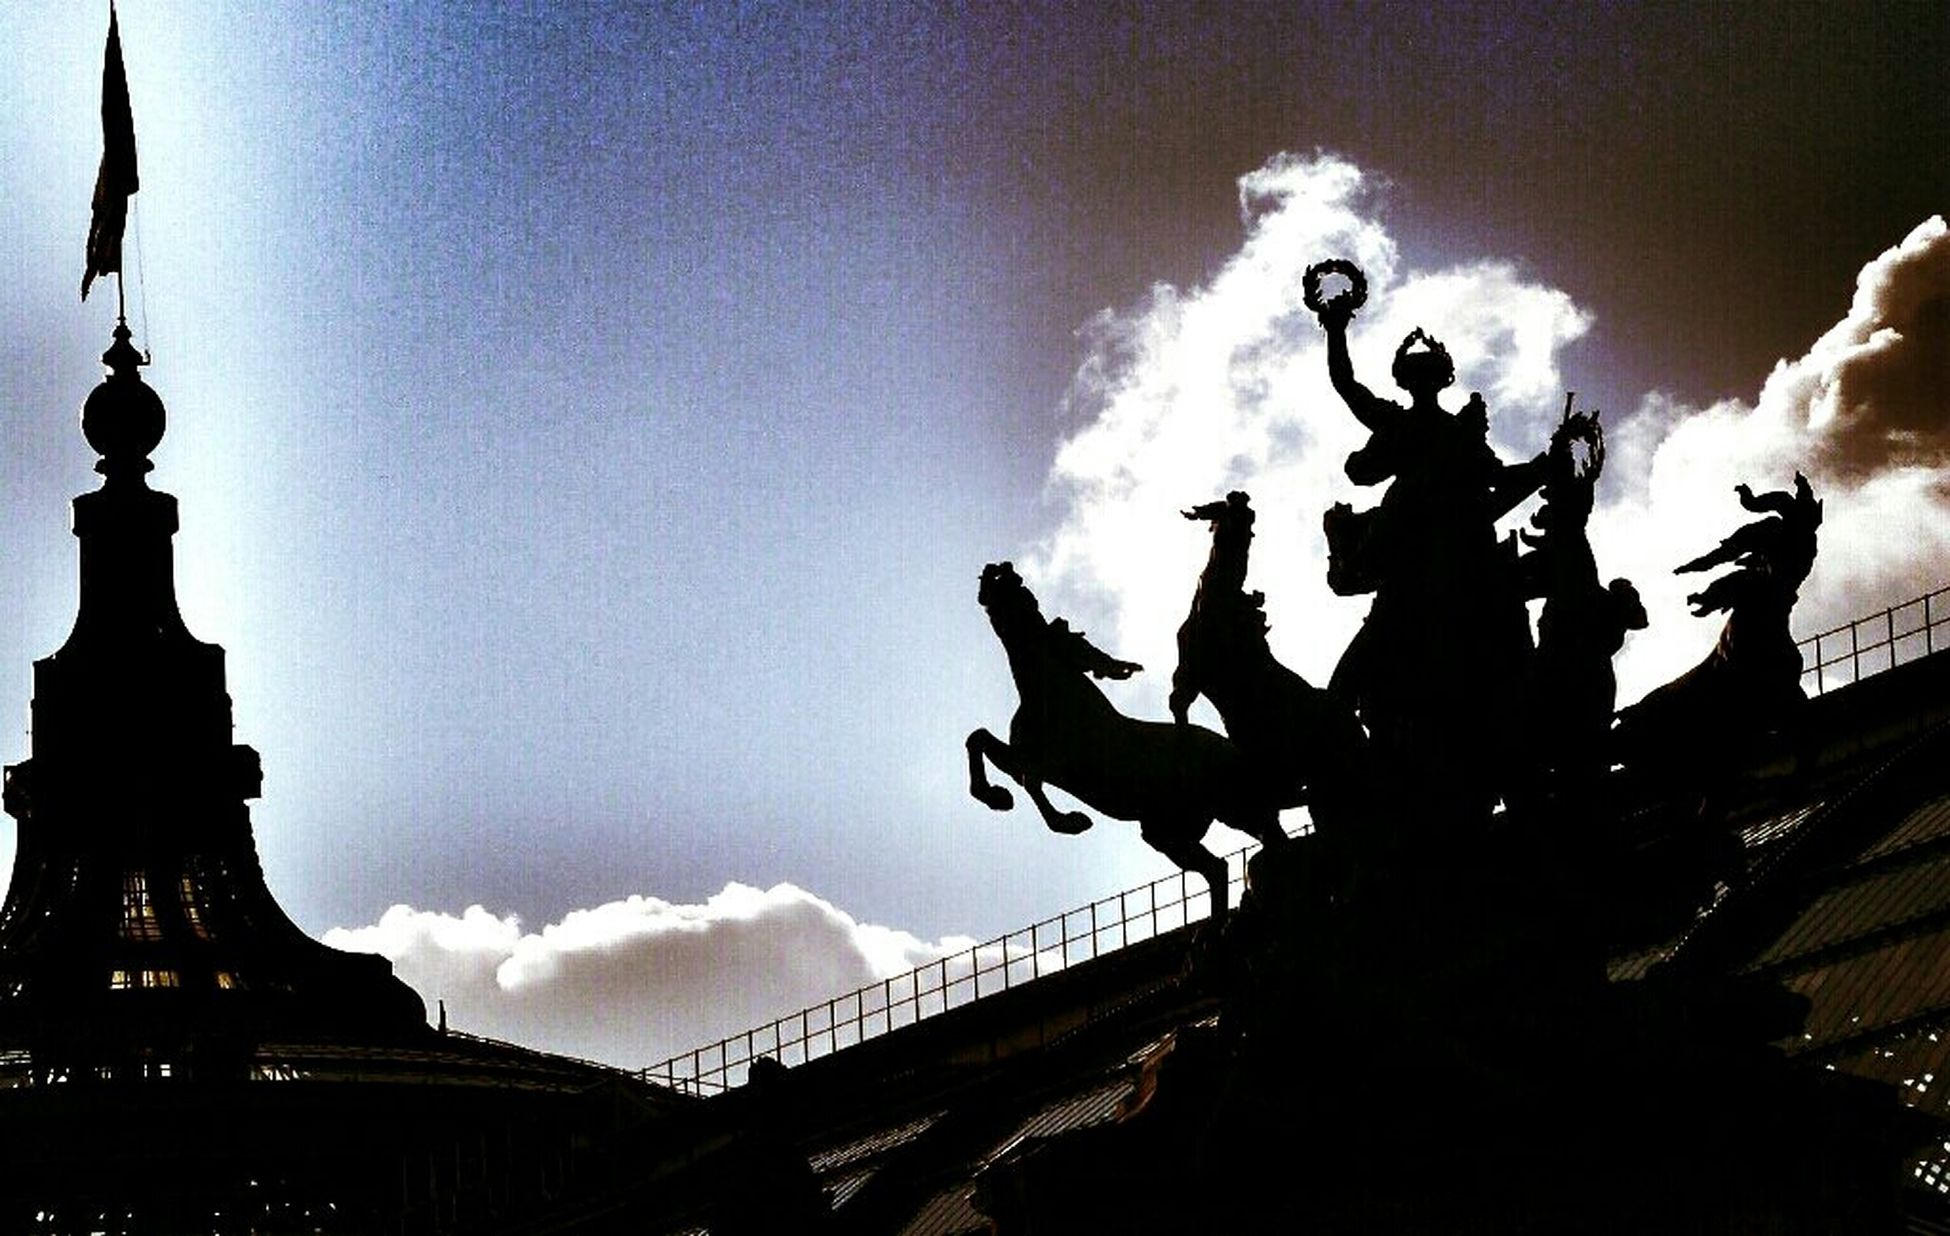 statue, sculpture, human representation, silhouette, art and craft, sky, art, low angle view, creativity, built structure, architecture, famous place, men, tourism, travel destinations, lifestyles, international landmark, sunset